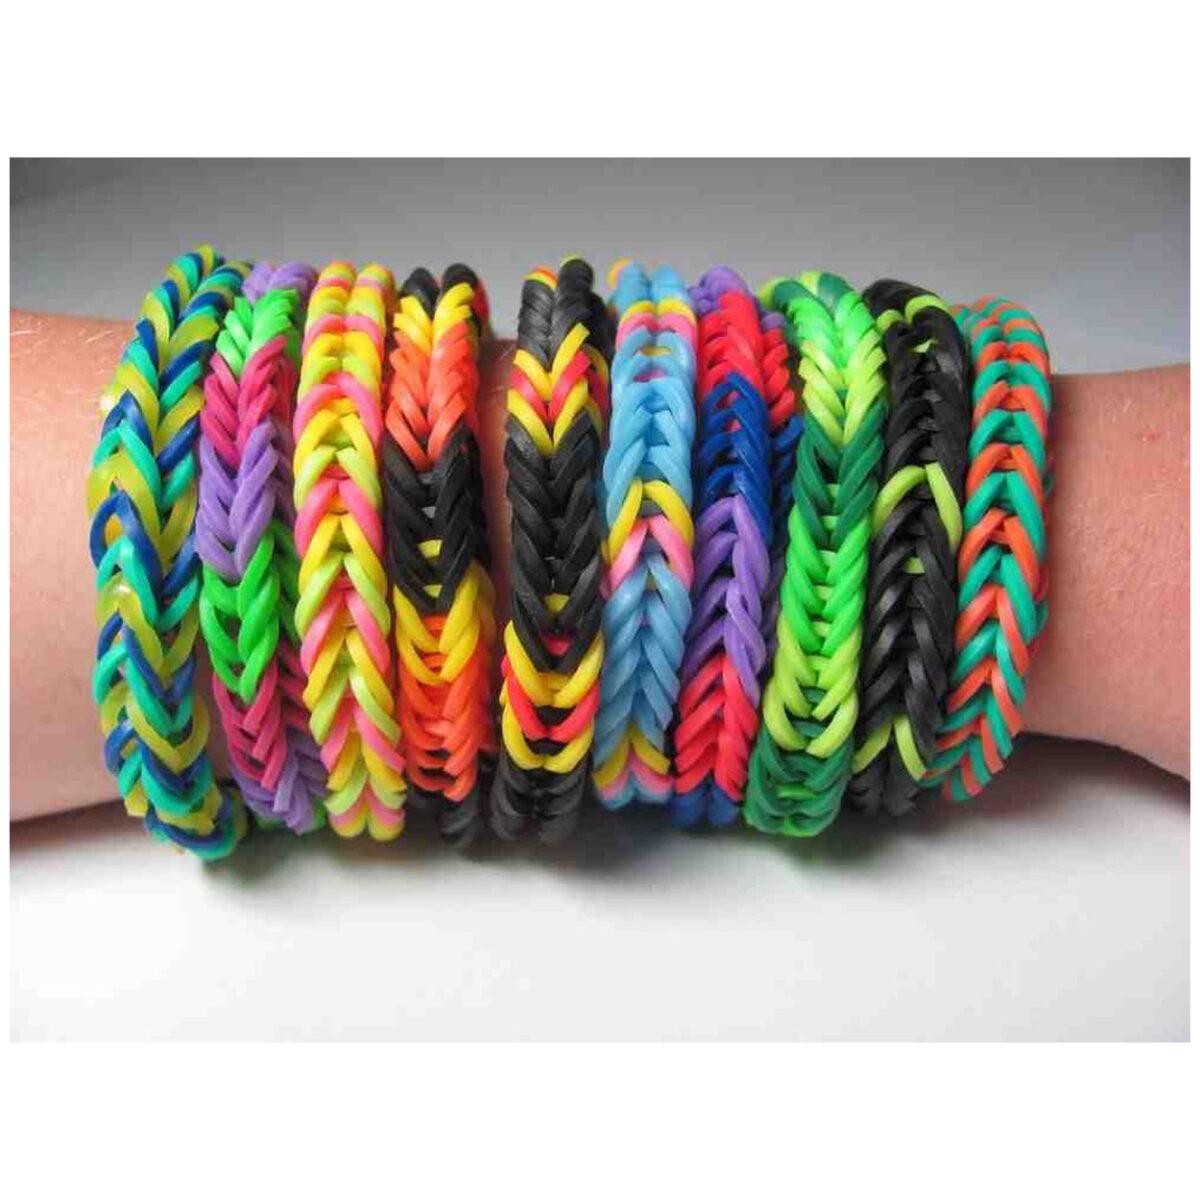 SUPER OFFERTA 100 Pz Elastici Neon Loom Bands